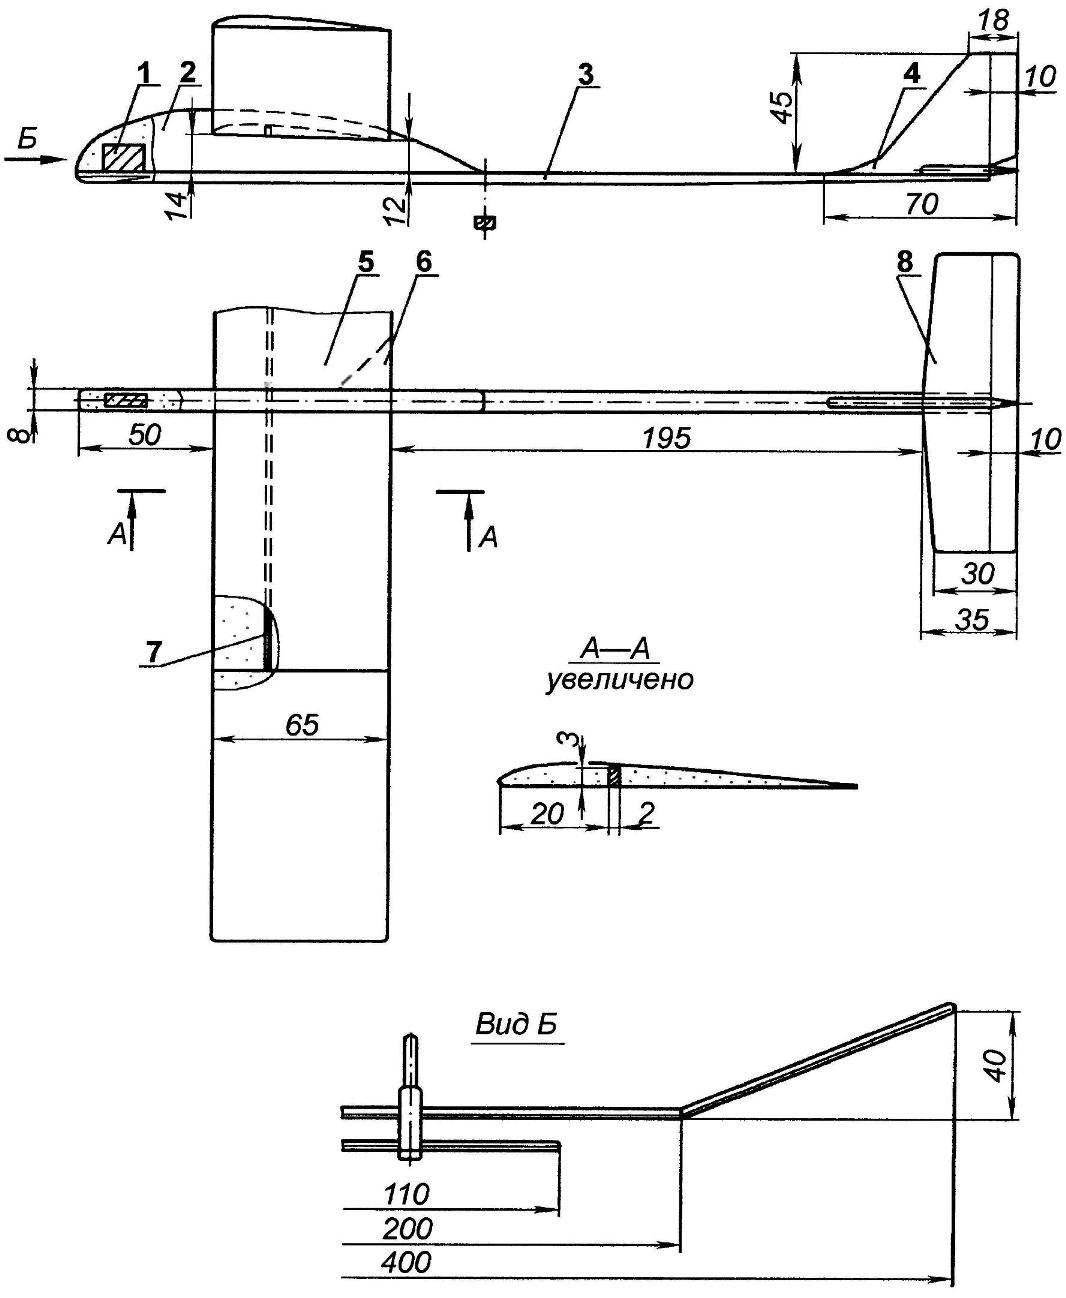 Fig. 3. Model throwing glider